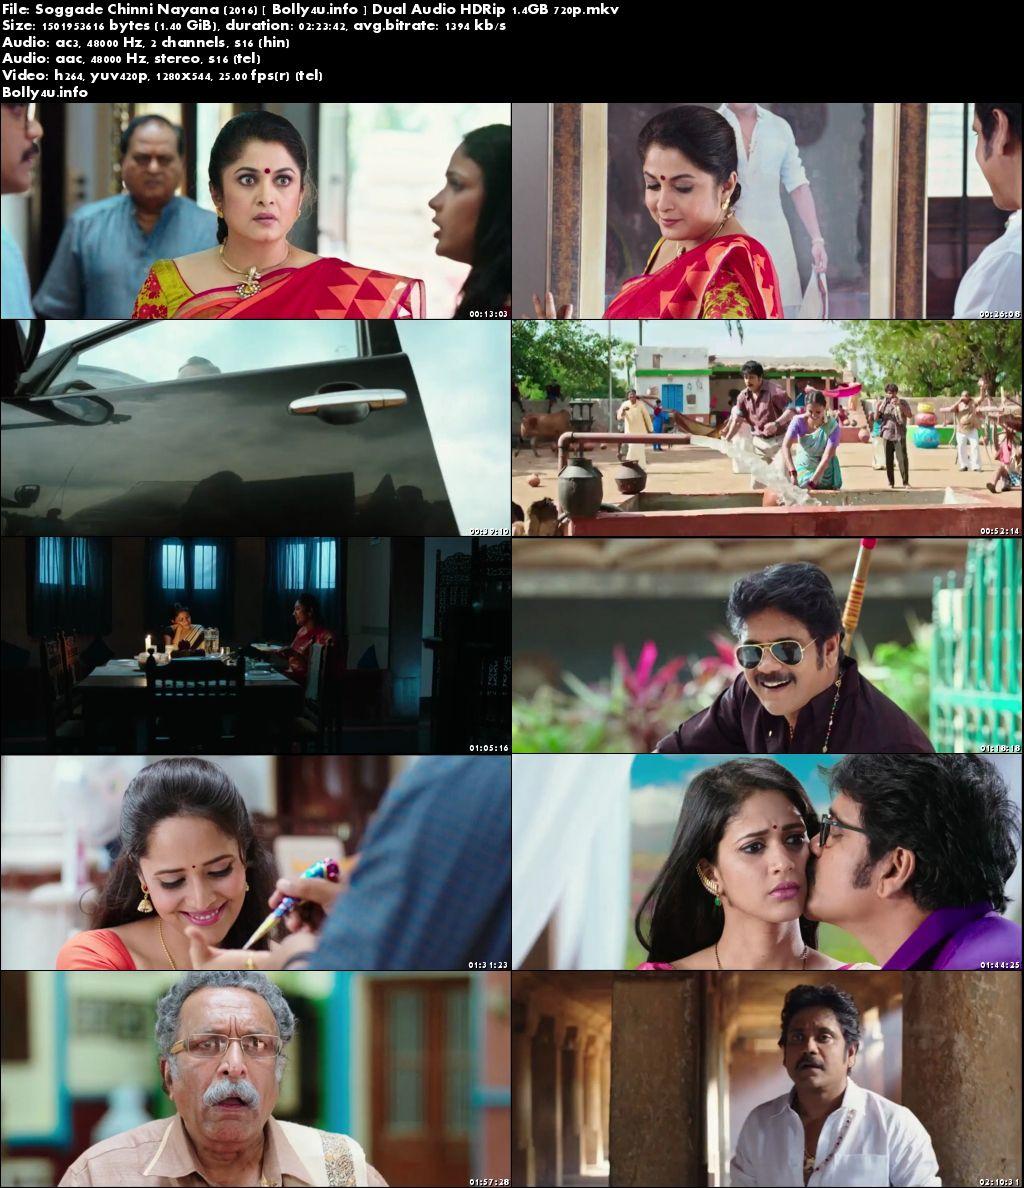 Screen Shoots of Soggade Chinni Nayana 2016 HDRip 1.4Gb Hindi Dual Audio 720p Watch Online Free at Bolly4u.info